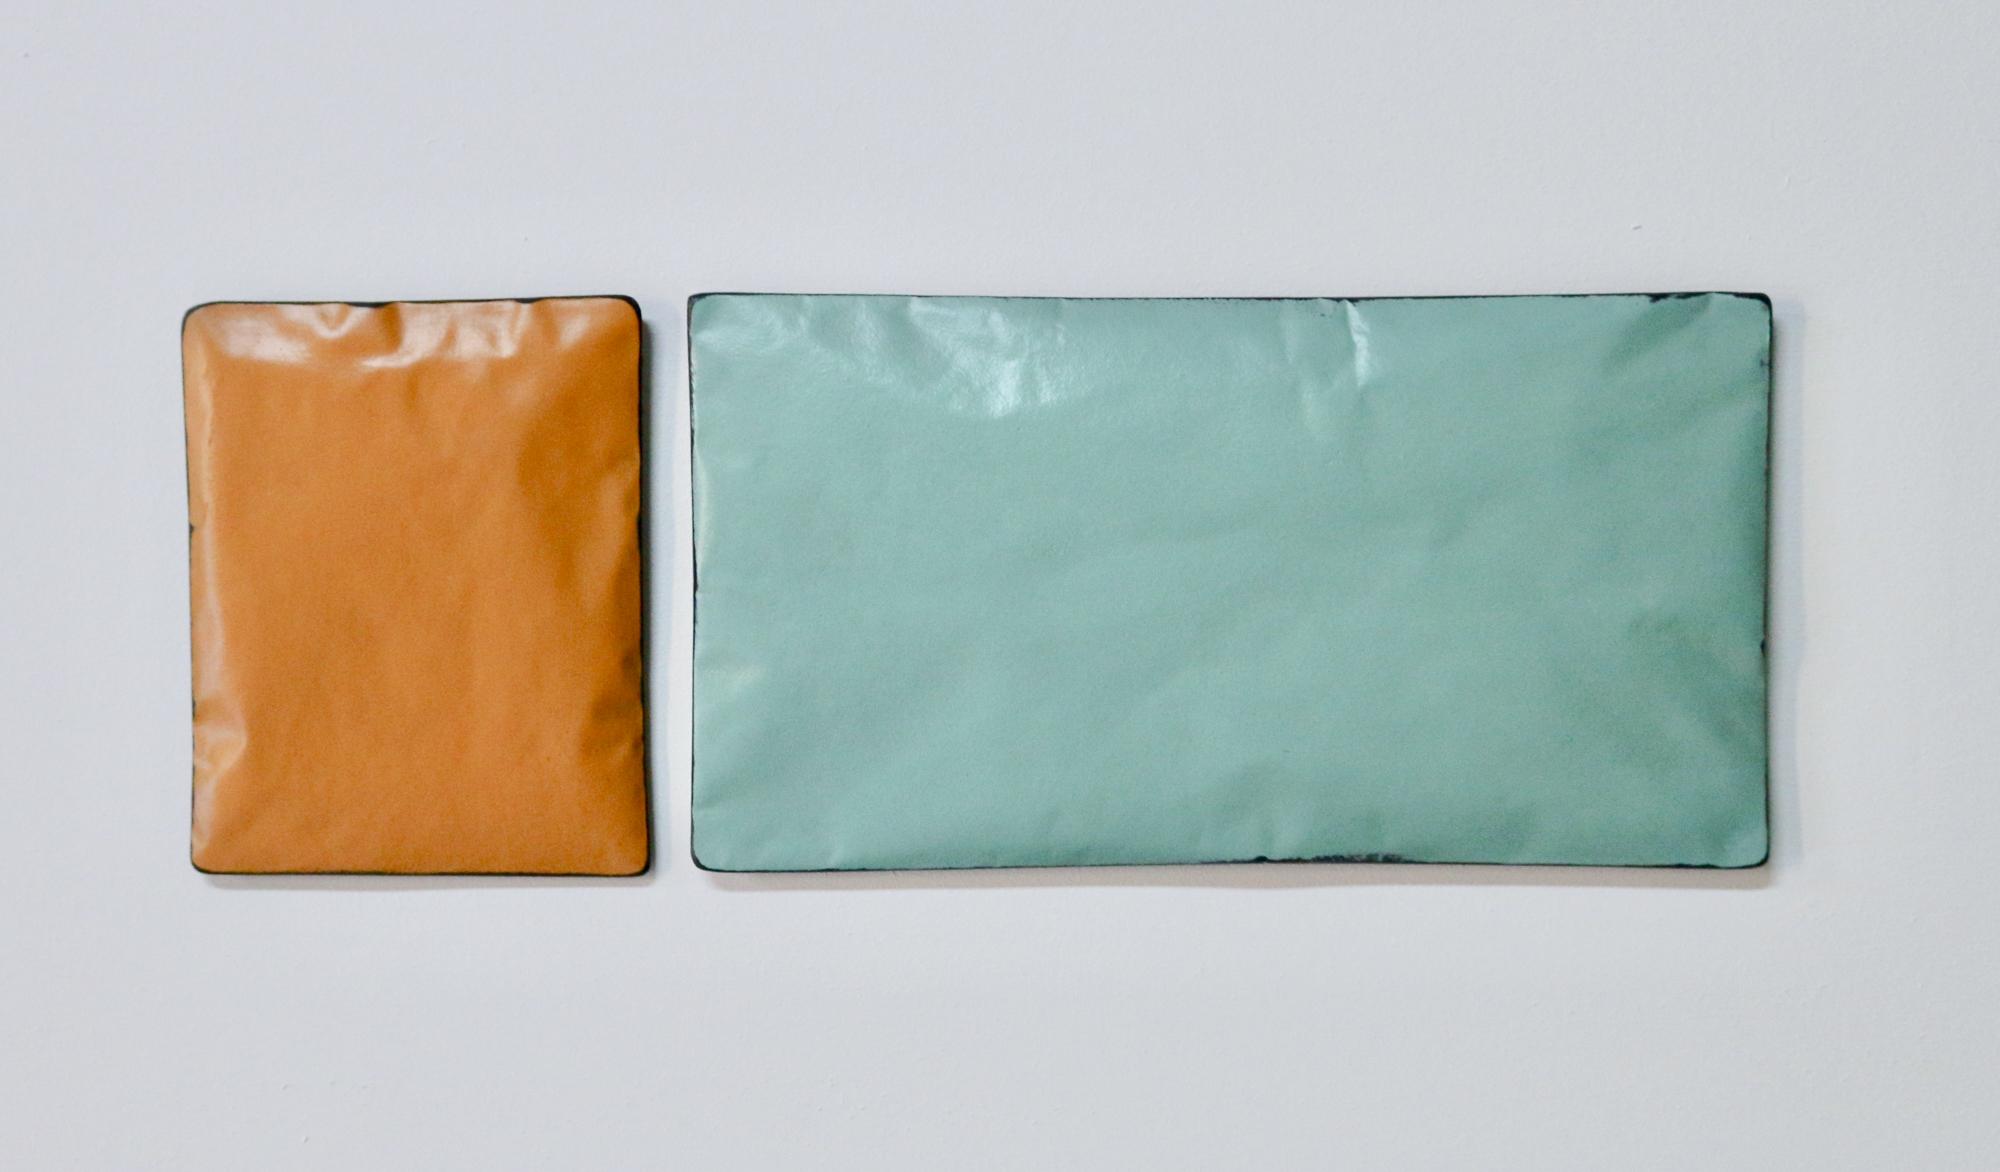 Johan De Wit, Untitled, 2018, Paper, Resin, Marble, Acrylic, 41x15cm(2 pces), Affinity Art